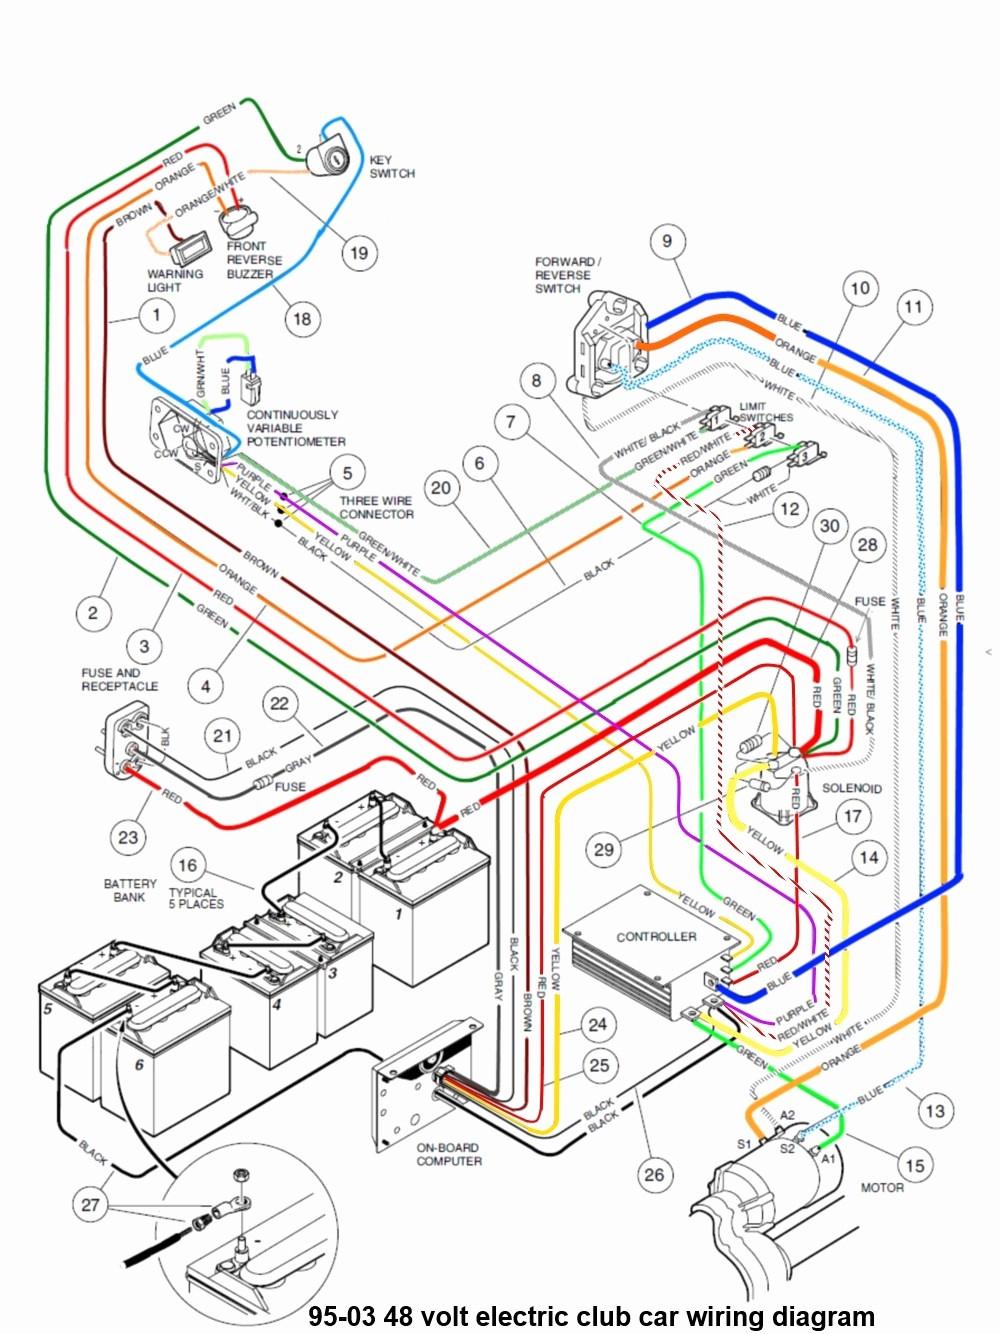 Club Car Wiring - Wiring Diagram Description - 48 Volt Golf Cart Wiring Diagram